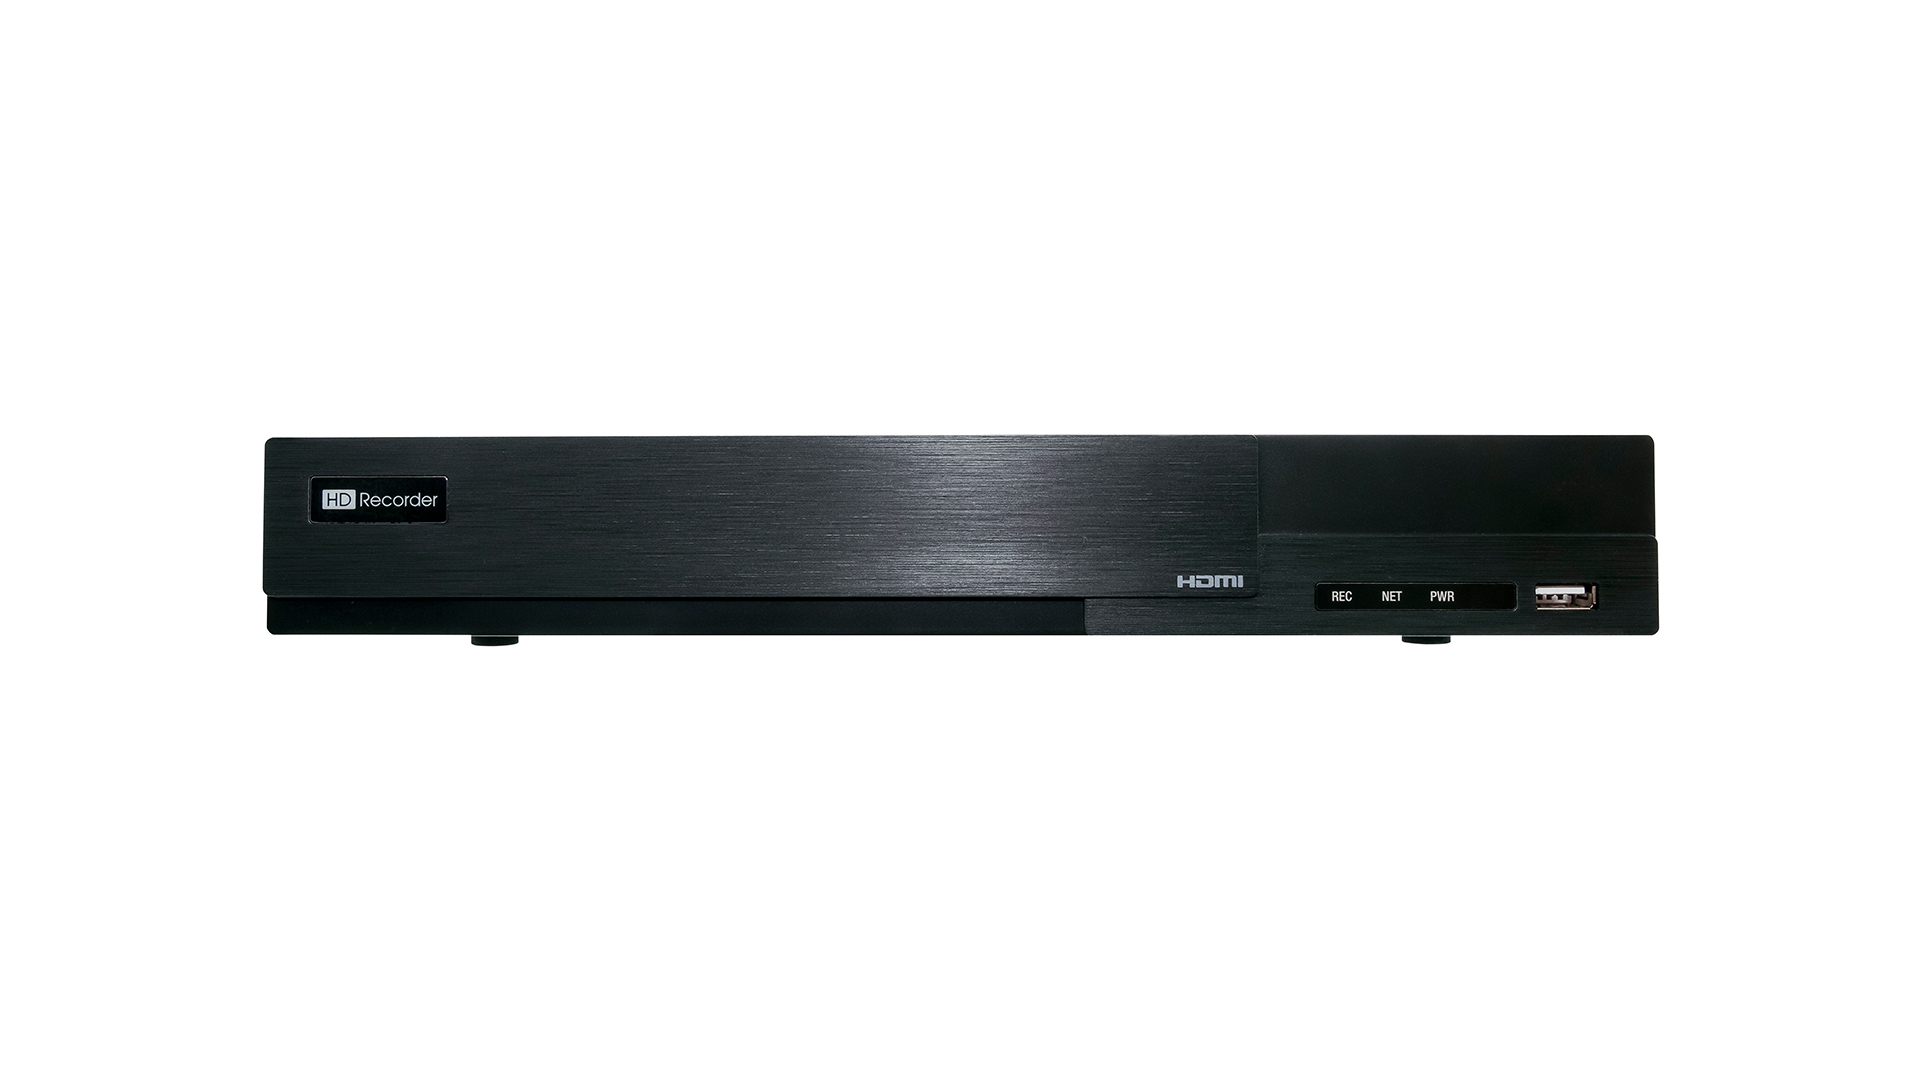 4chハードディスクネットワークビデオレコーダー